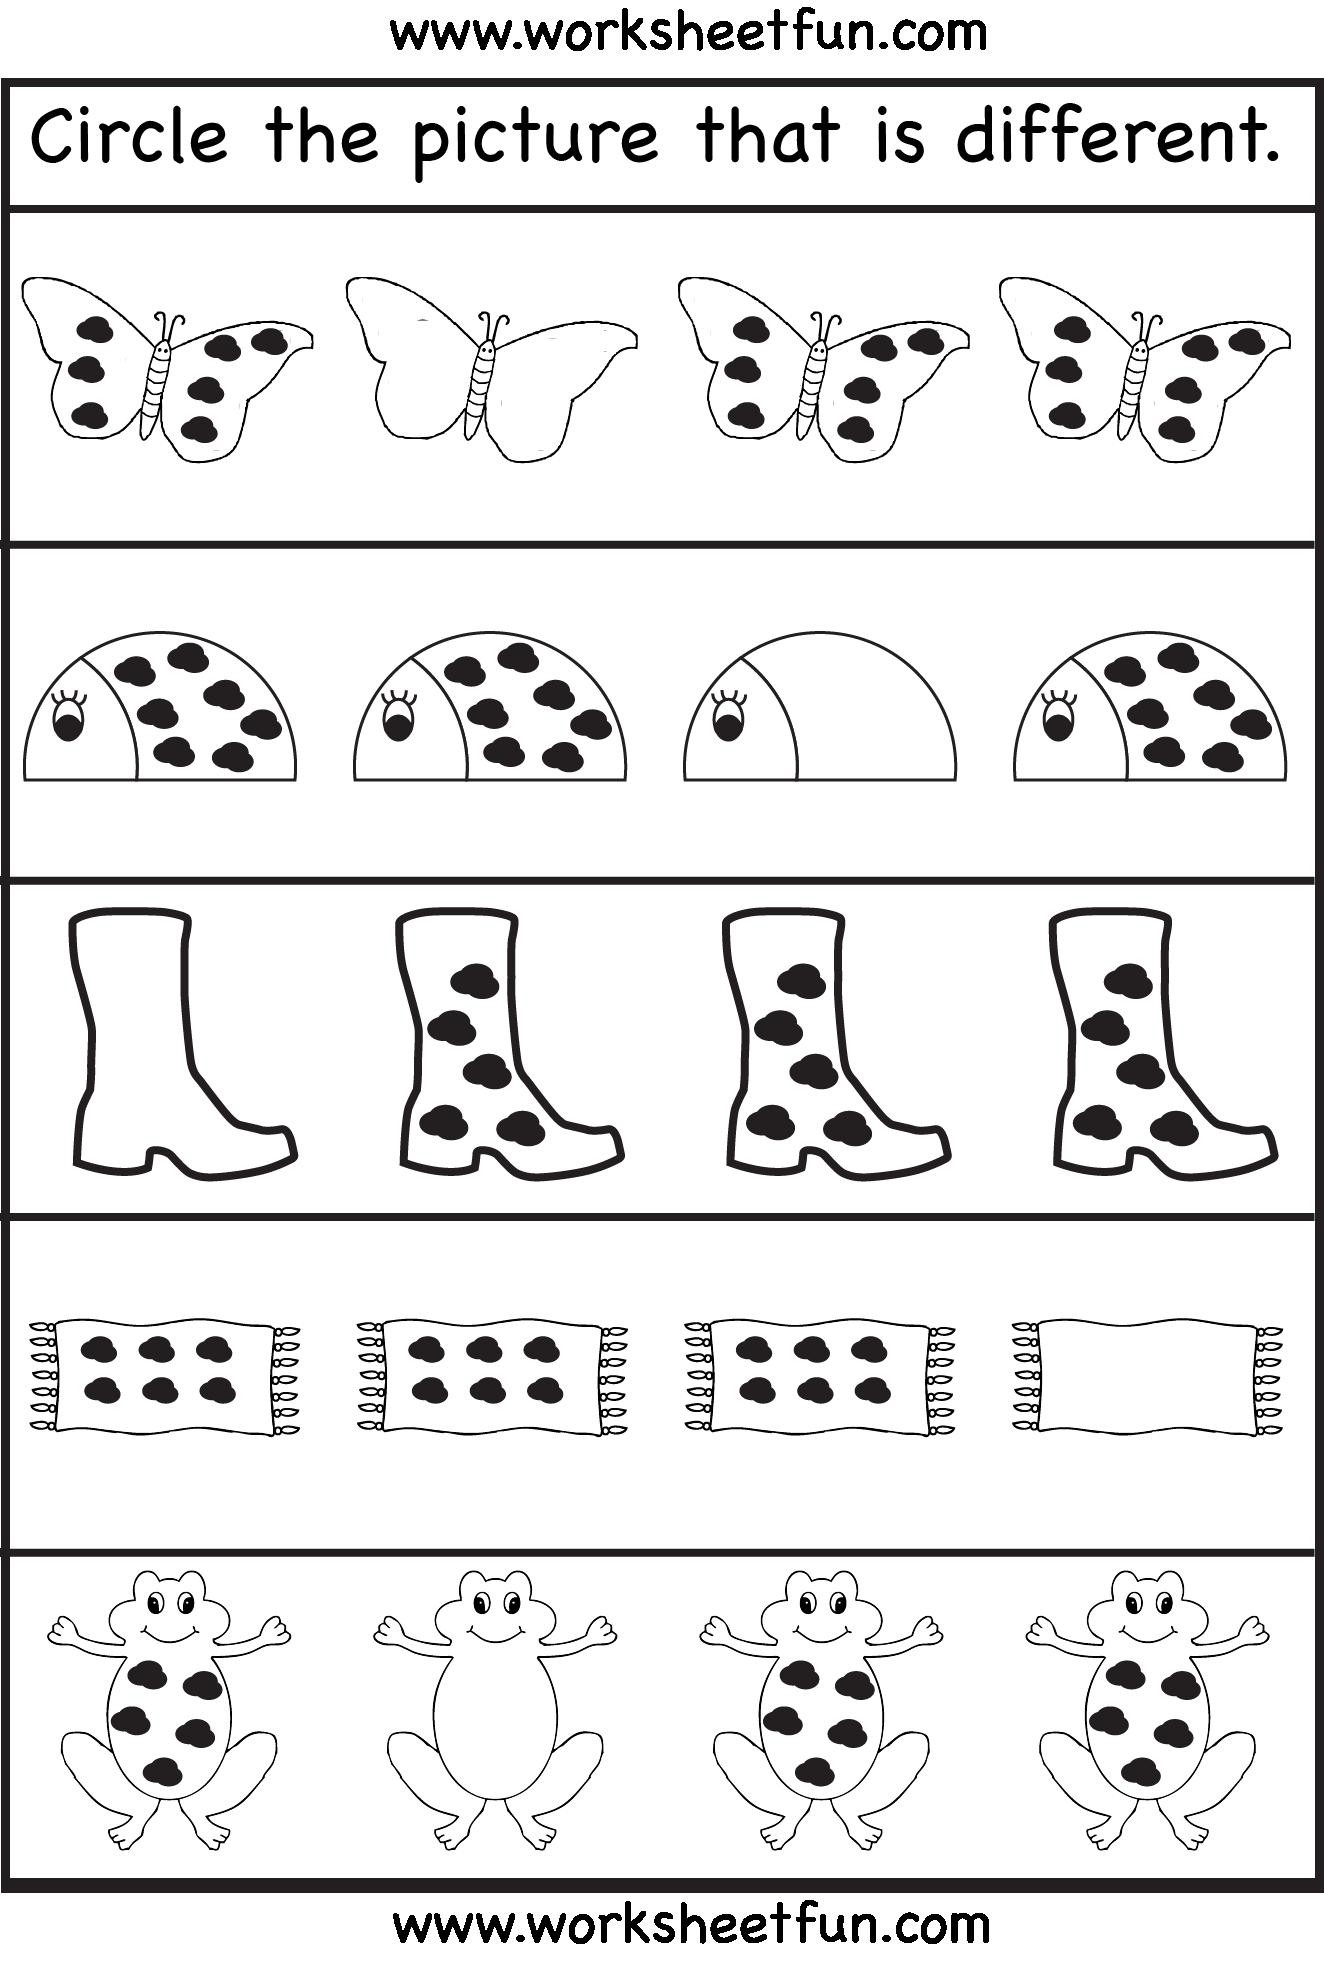 4 year old kindergarten worksheets